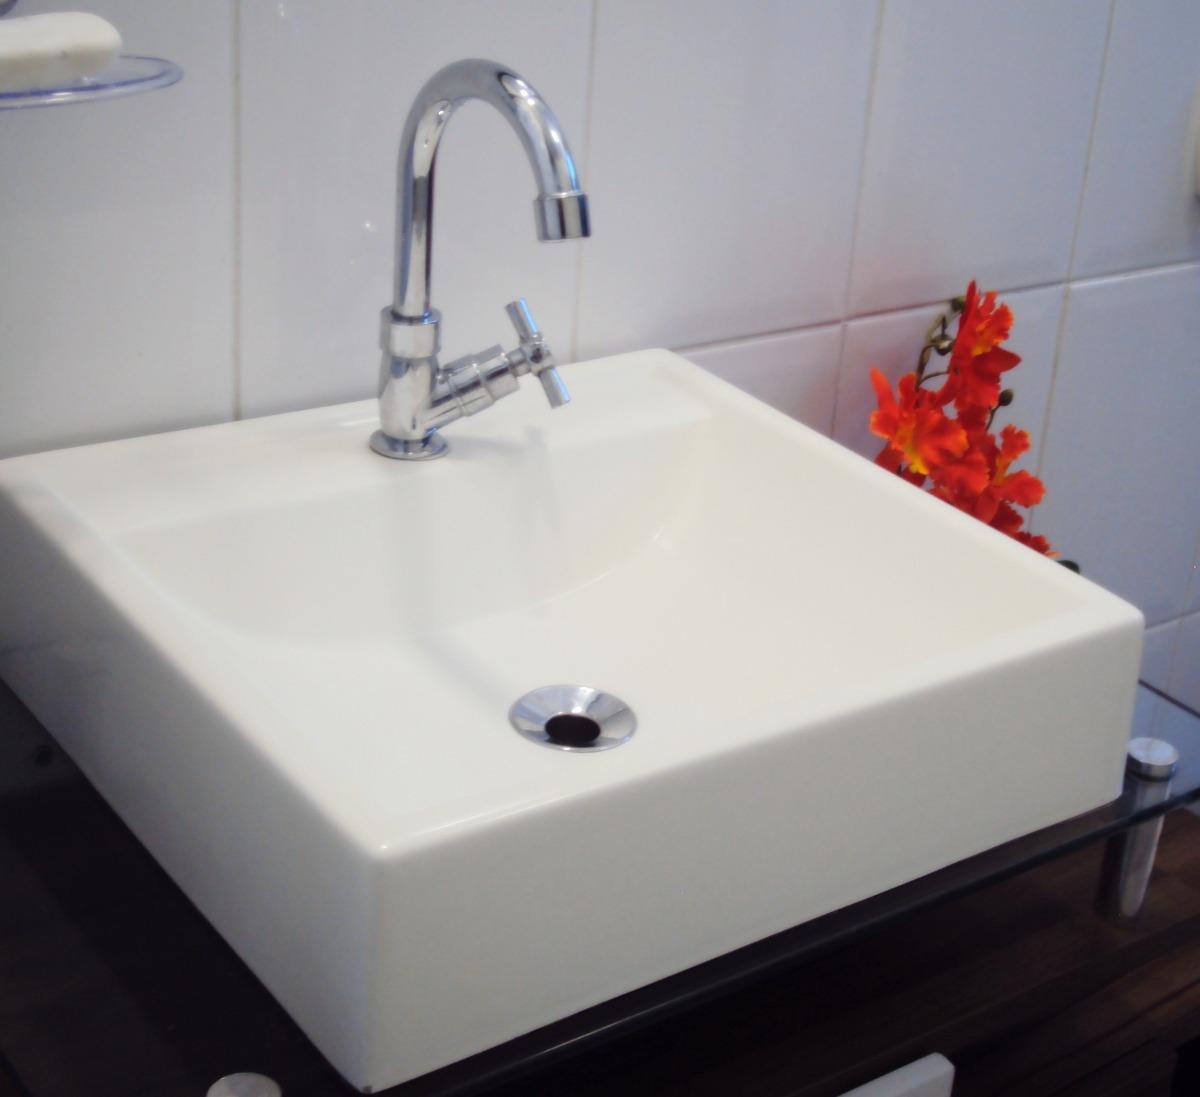 Pia Cuba Sobrepor Para Banheiro  R$ 99,90 no MercadoLivre # Cuba De Banheiro Sobrepor